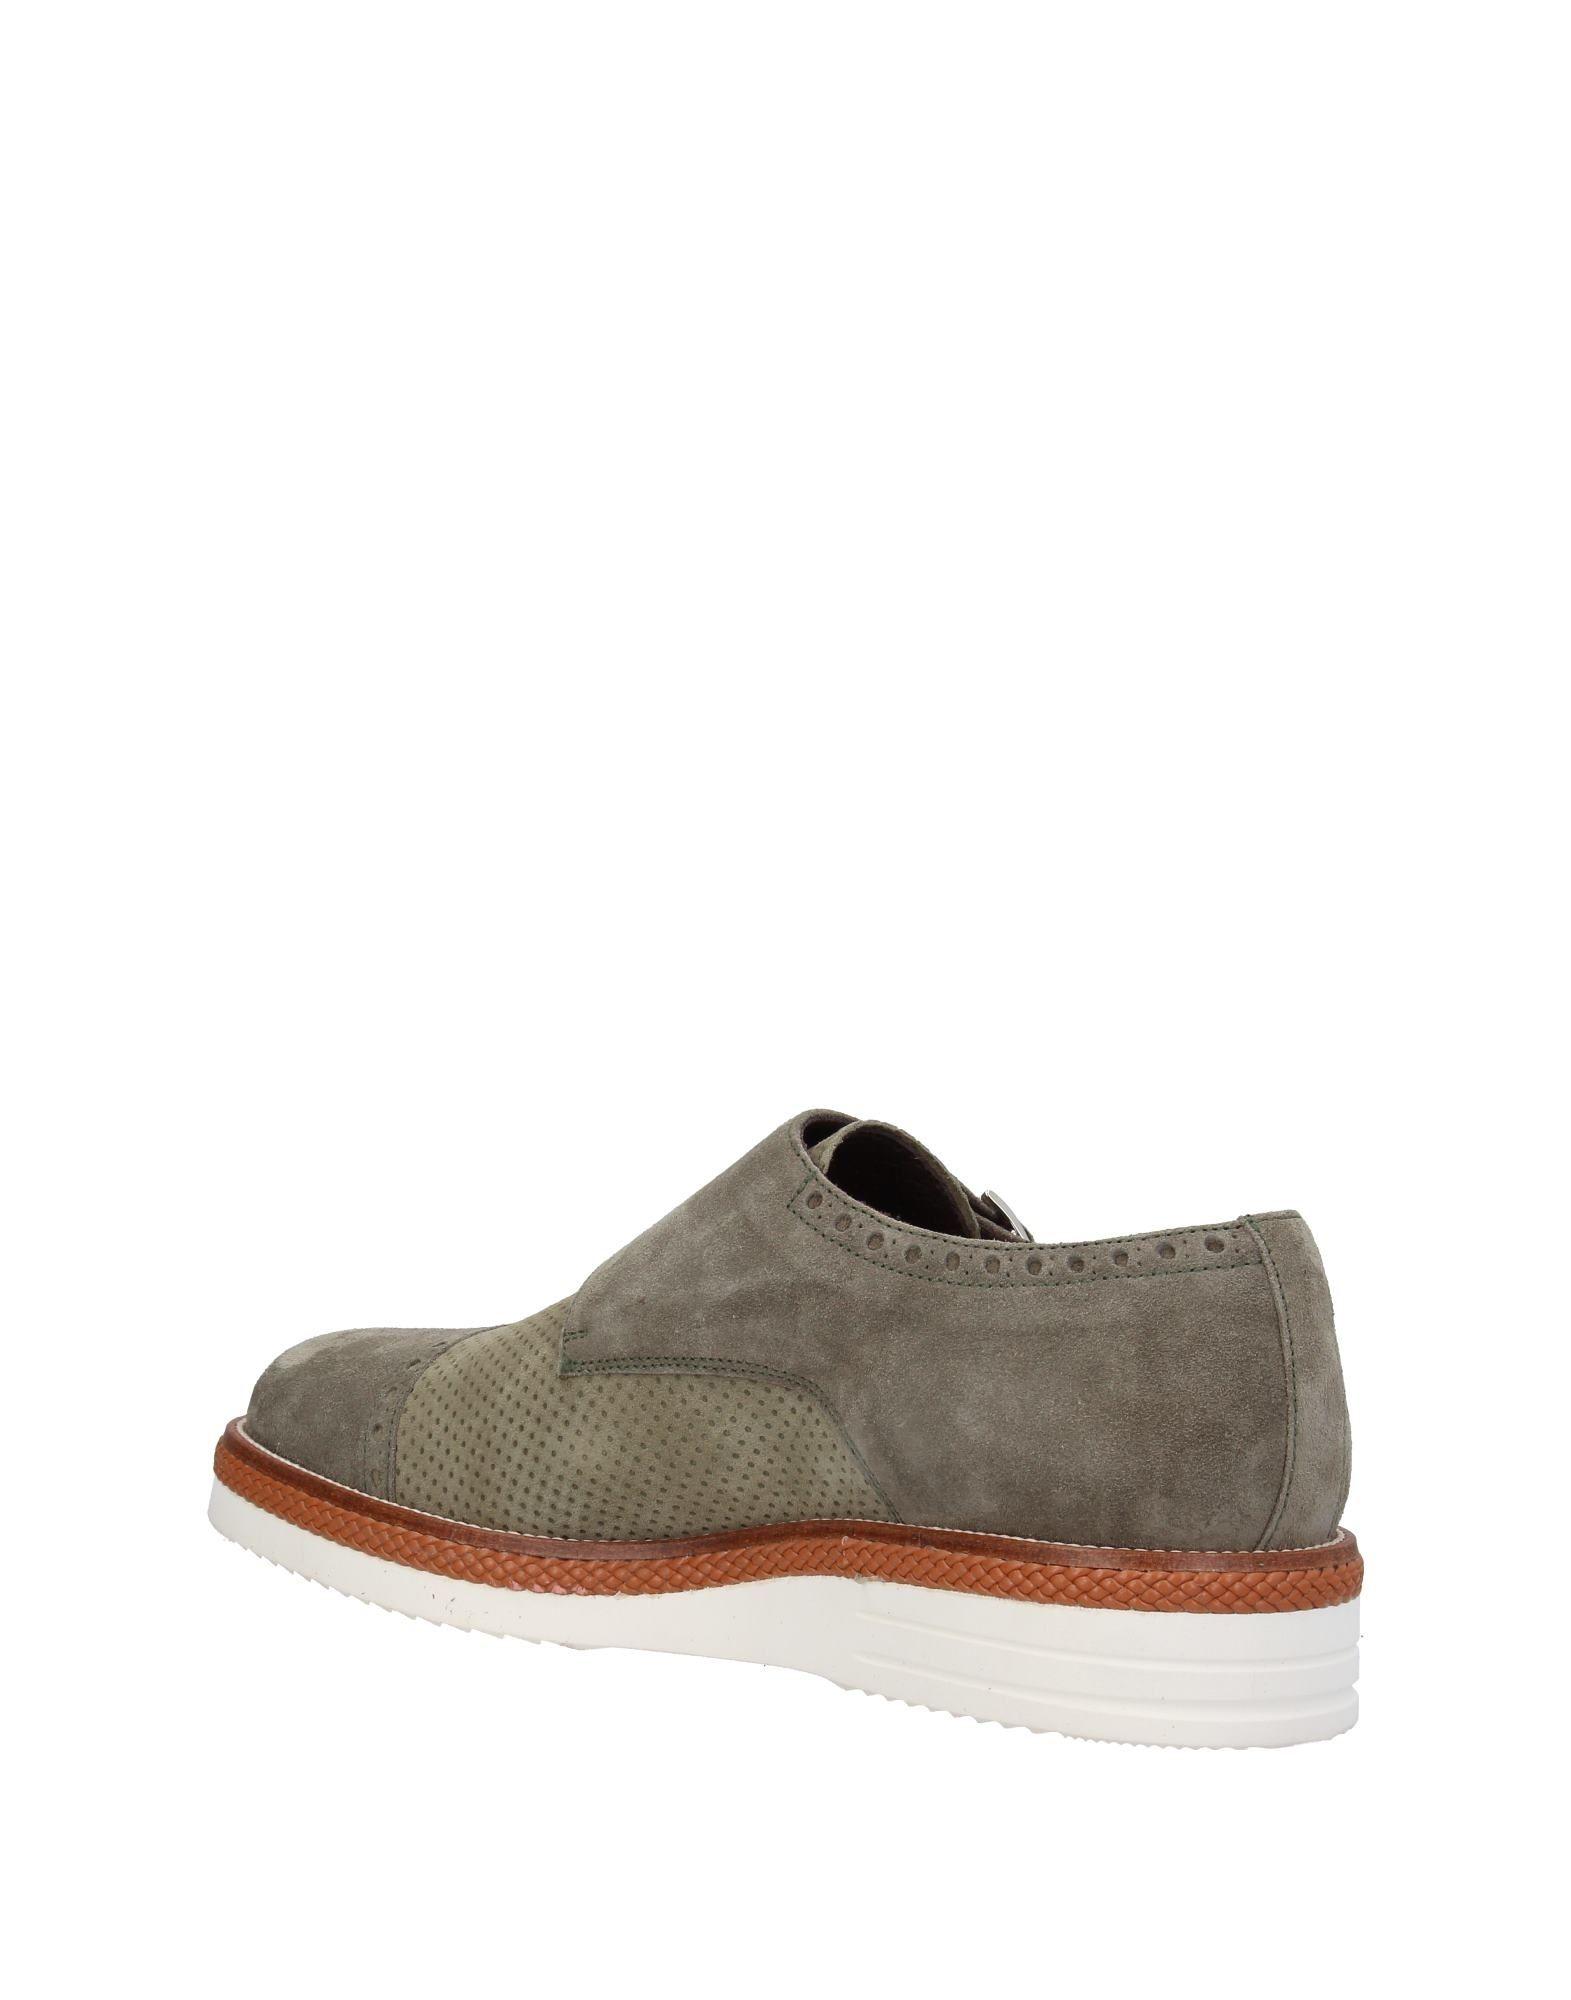 Rabatt echte Schuhe Pertini Mokassins Herren  11372218UG